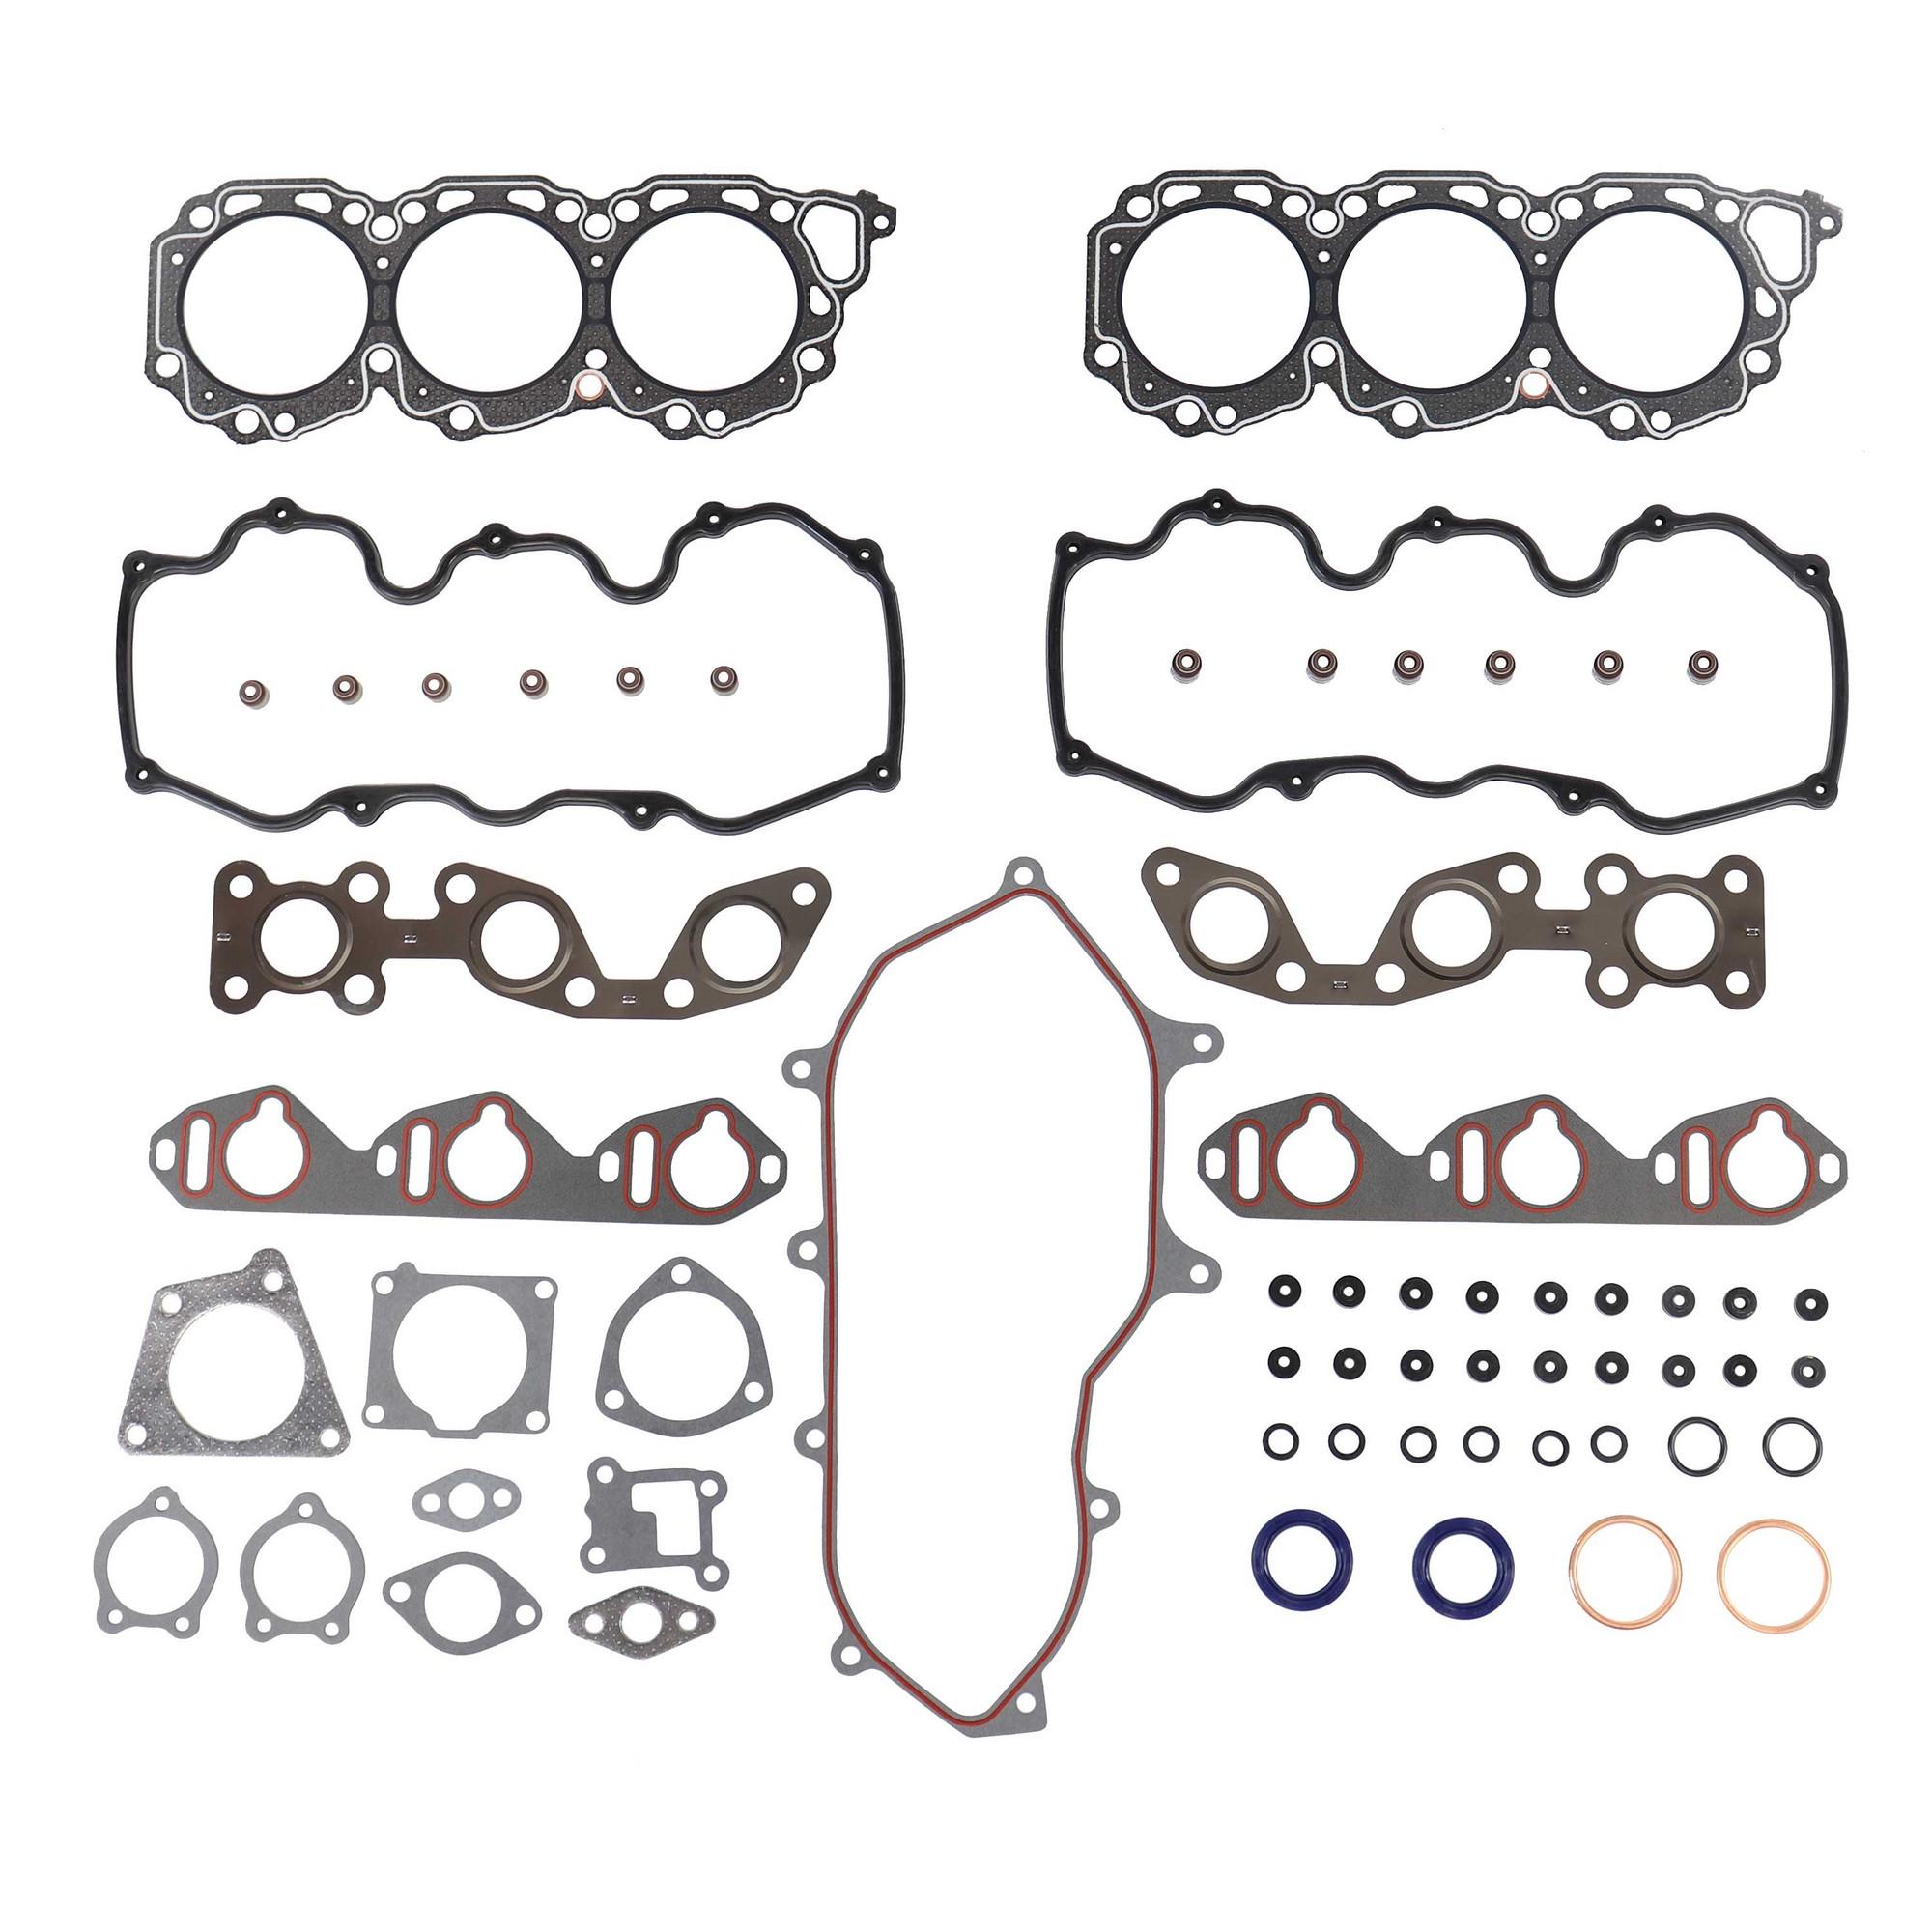 Dnj Hgs655 Head Gasket Set For 01 04 Nissan Frontier